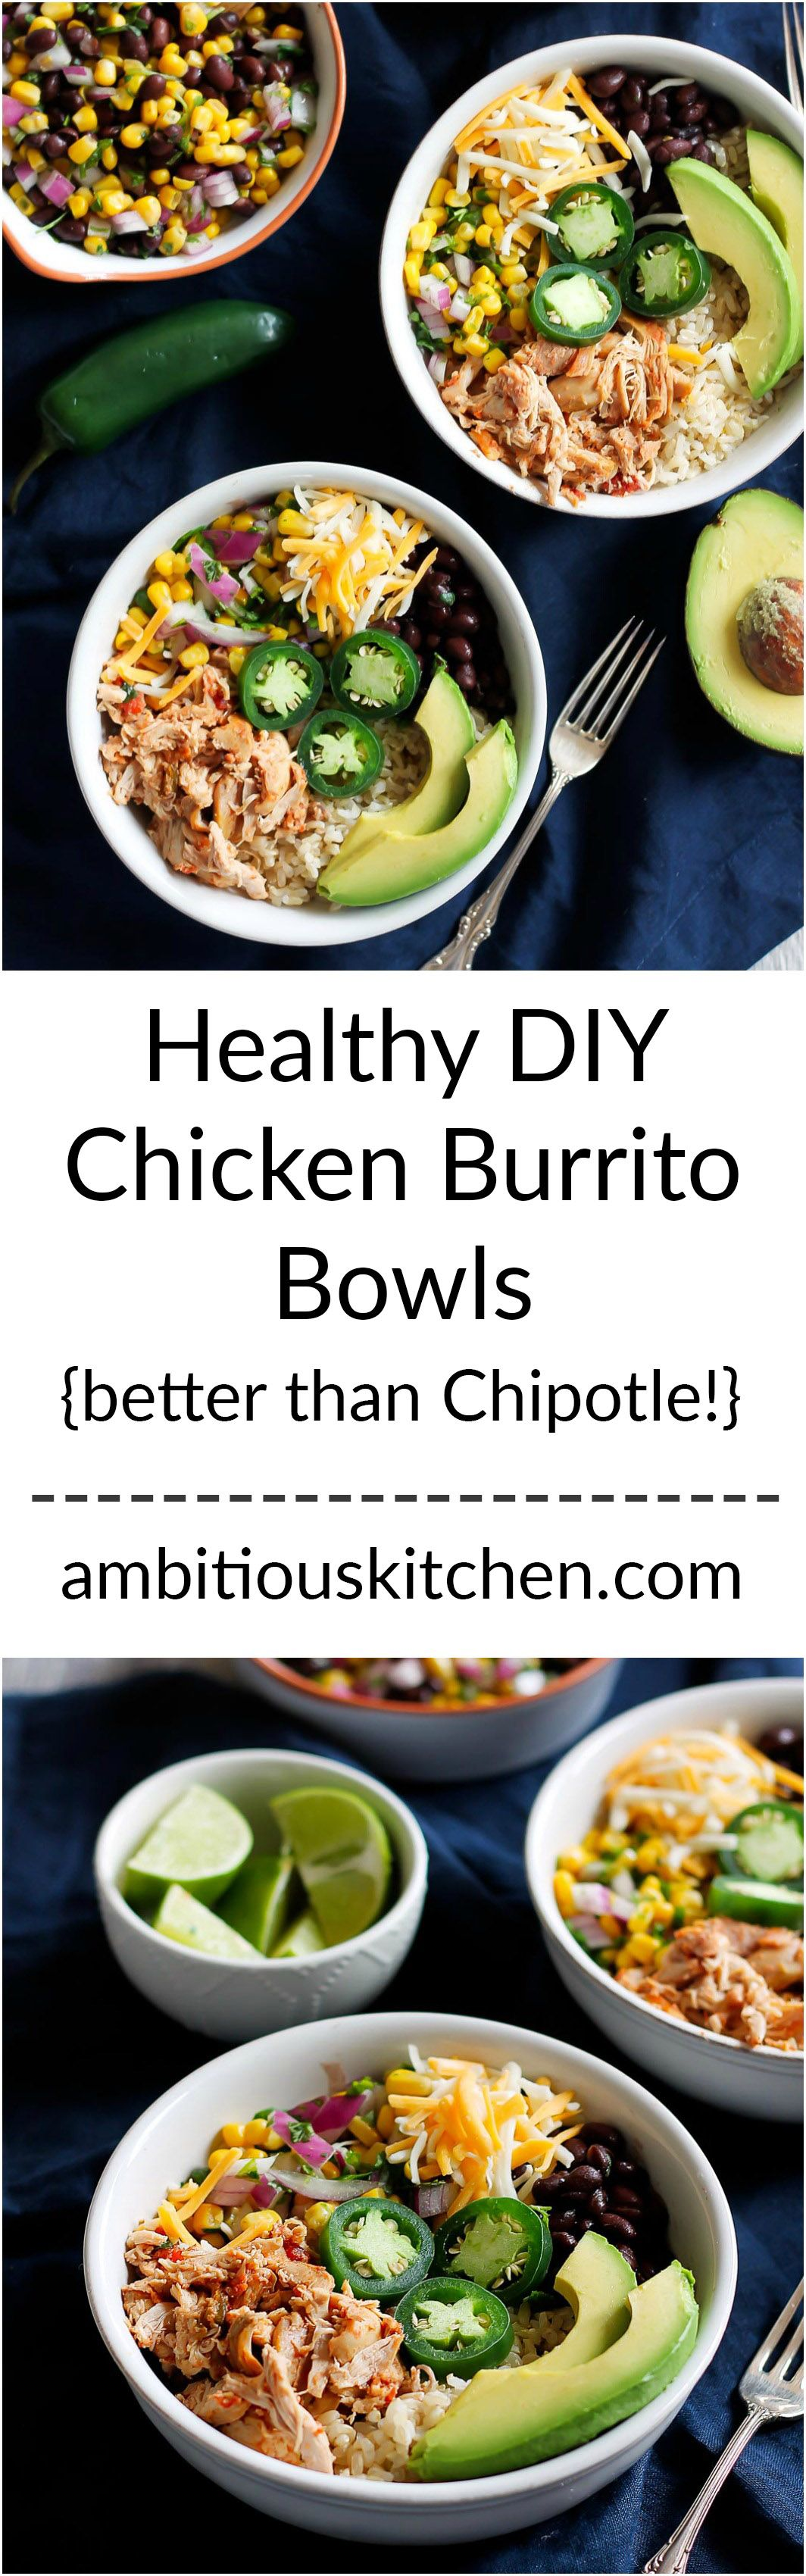 Cheap healthy meals - Cheap Healthy Meal Prep Idea Better Than Chipotle Diy Chicken Burrito Bowls